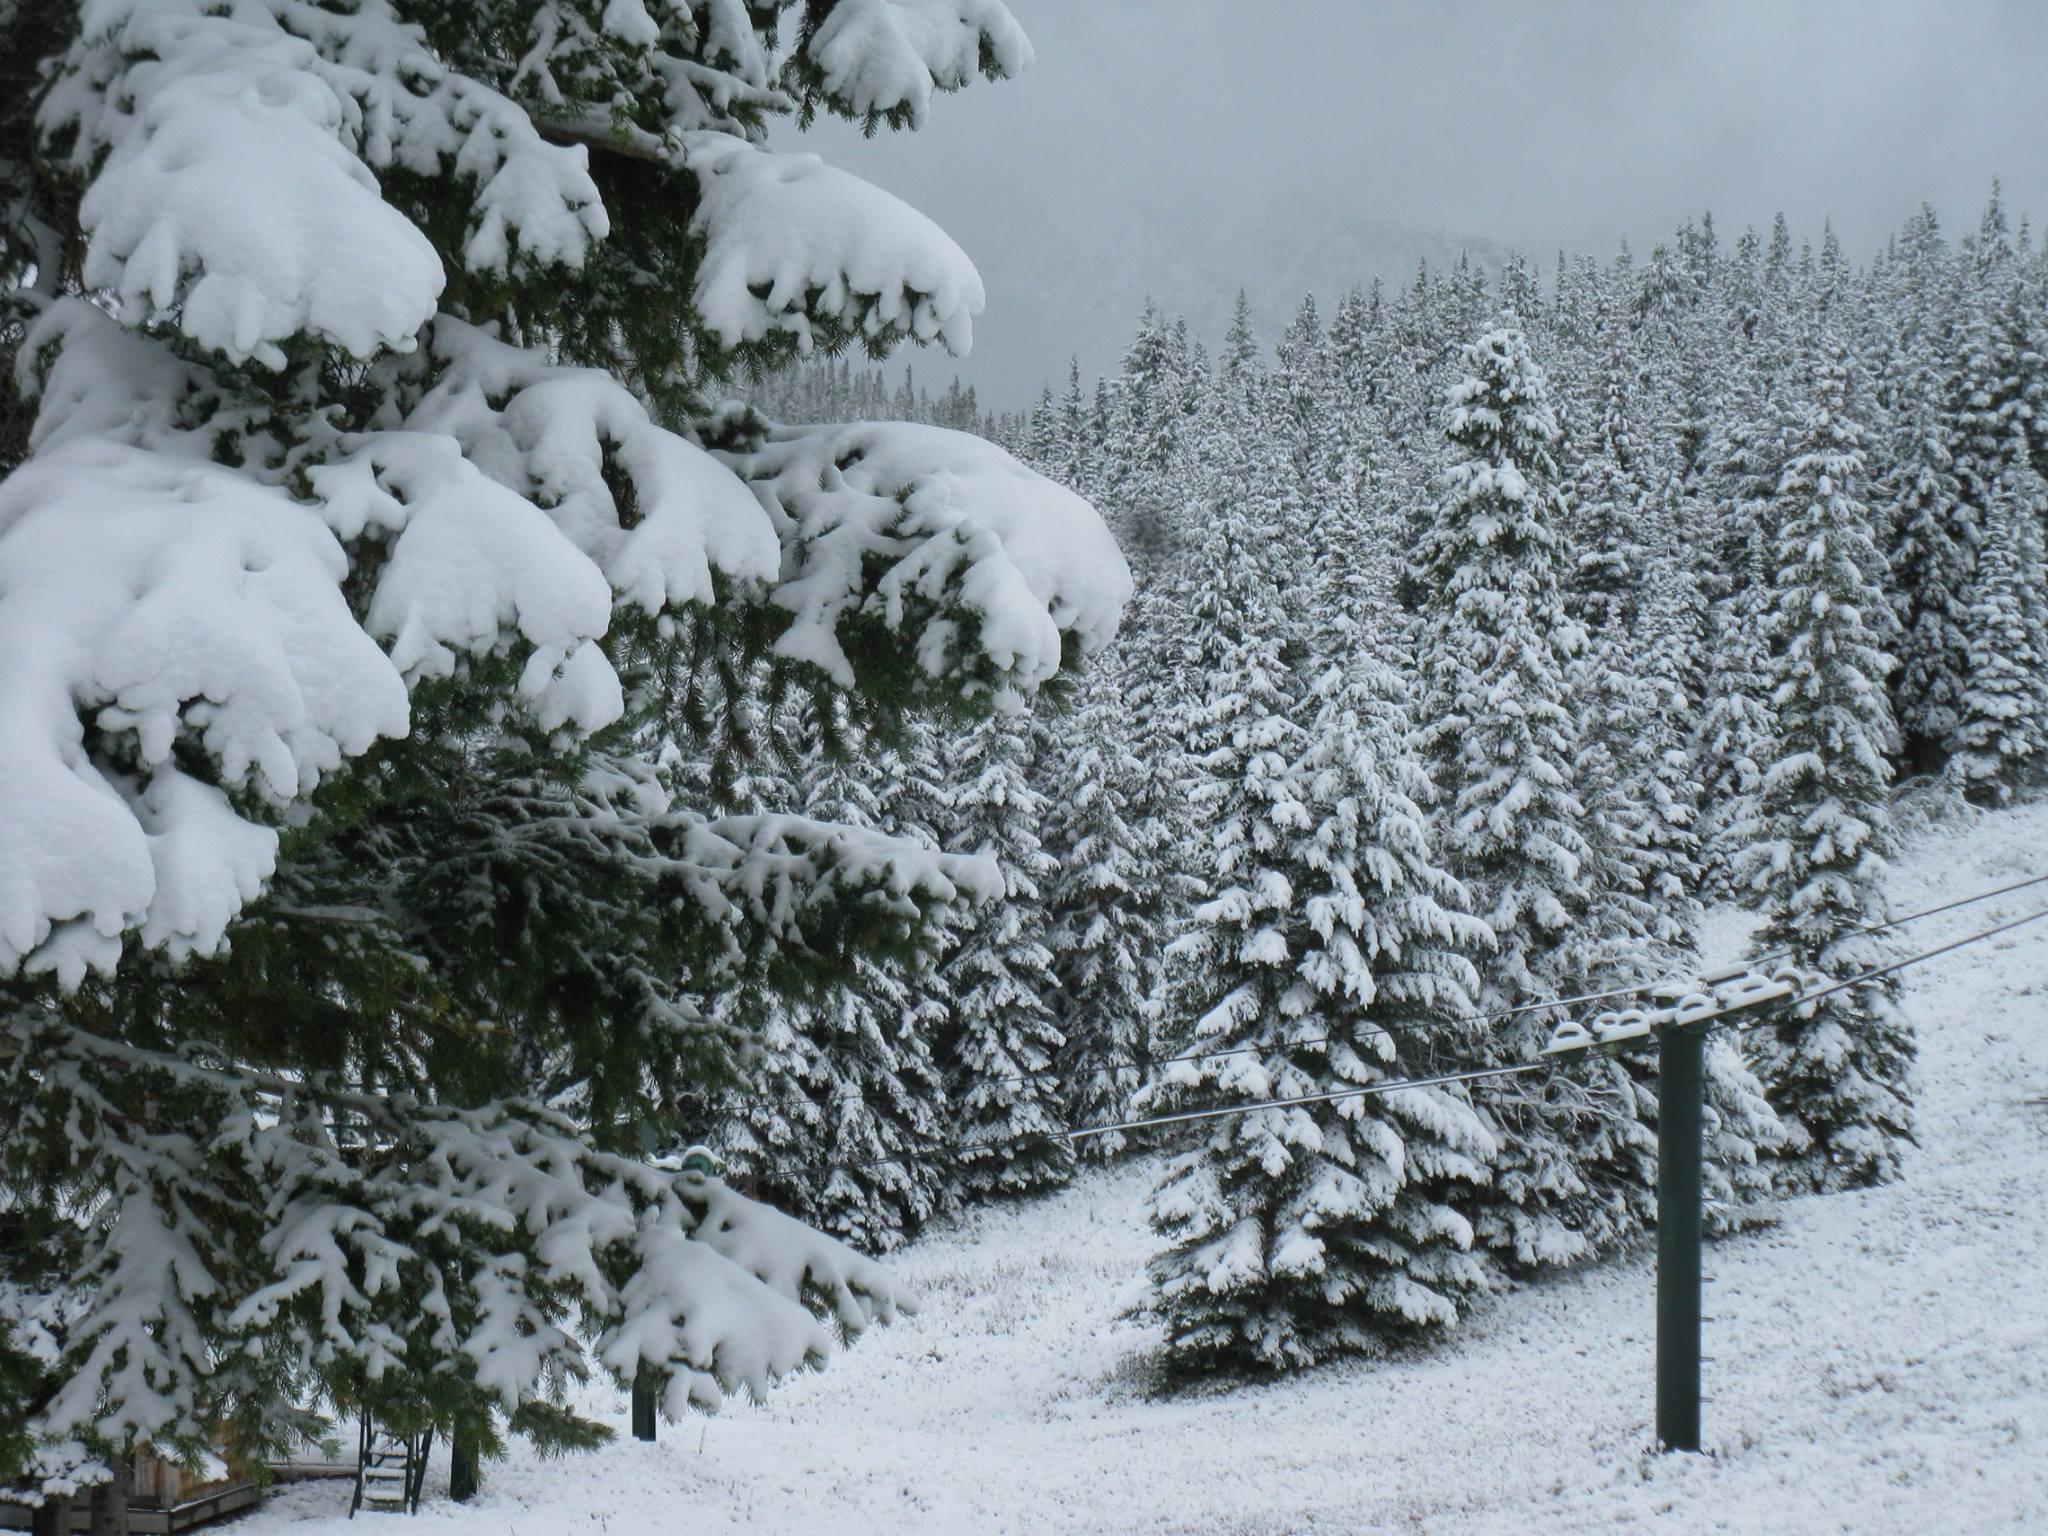 Teton Pass Ski Resort, MT on September 12th! photo: teton pass ski resort